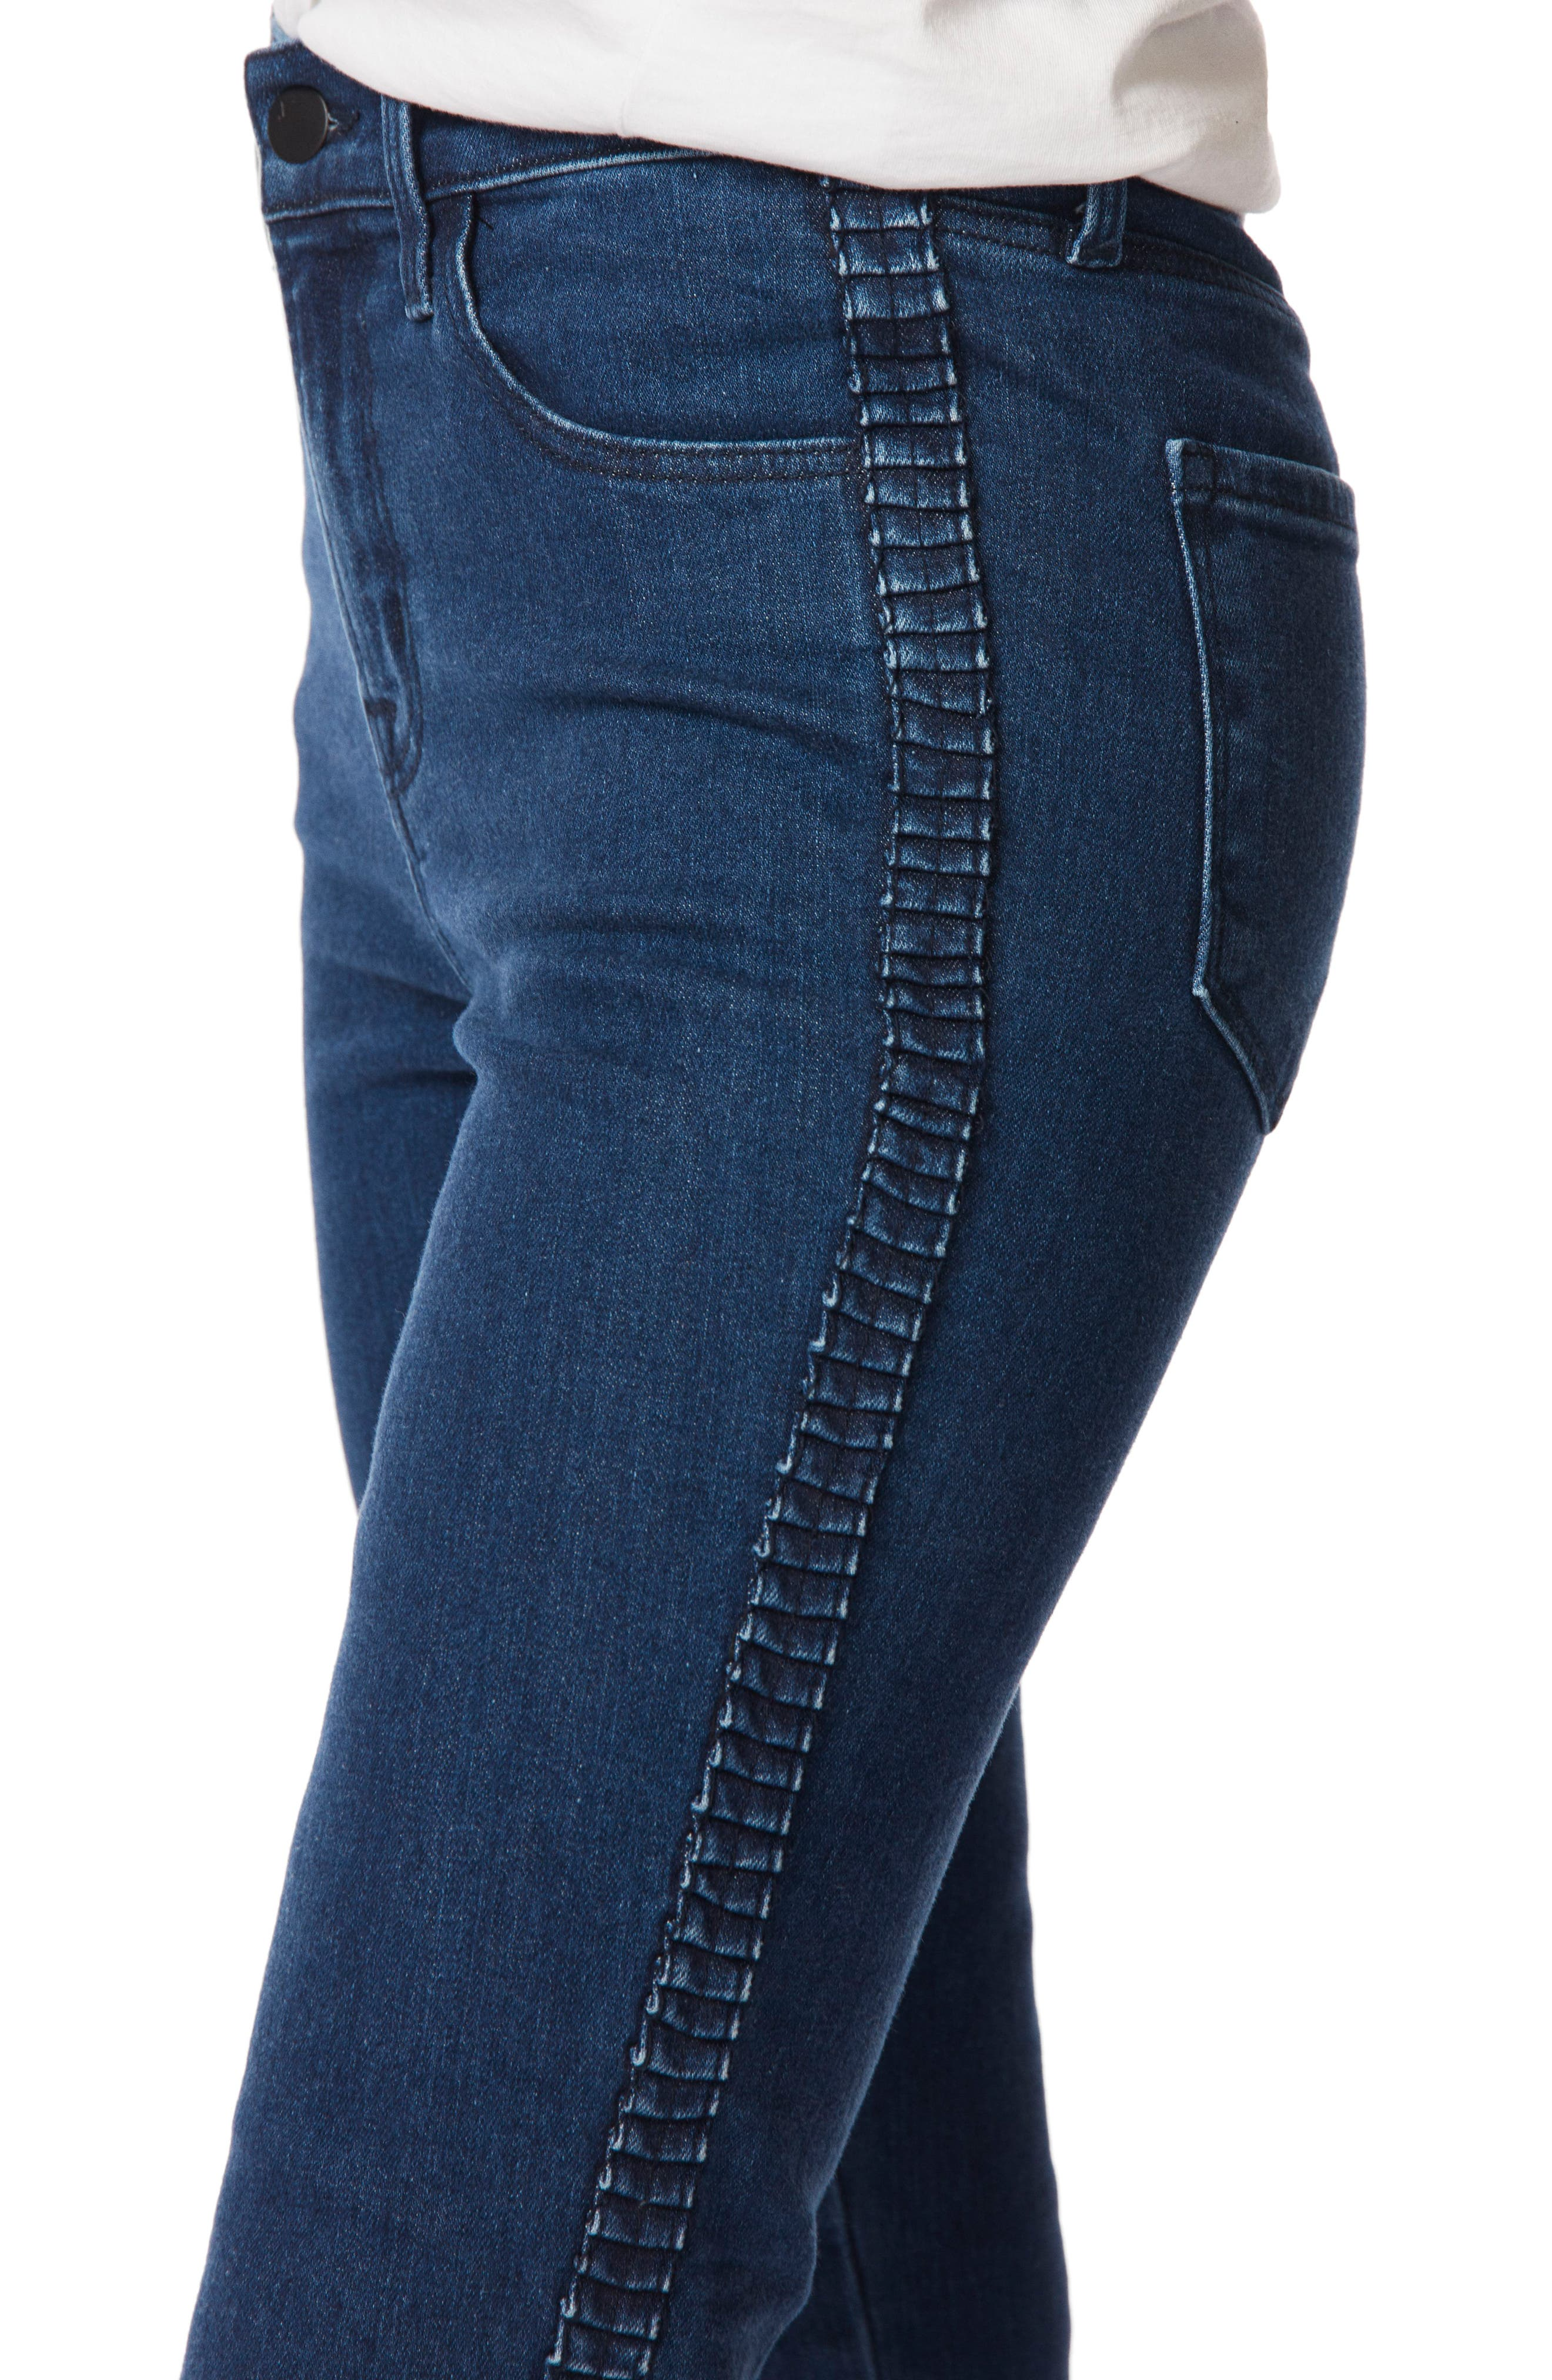 J BRAND,                             Alana High Waist Ankle Skinny Jeans,                             Alternate thumbnail 4, color,                             405